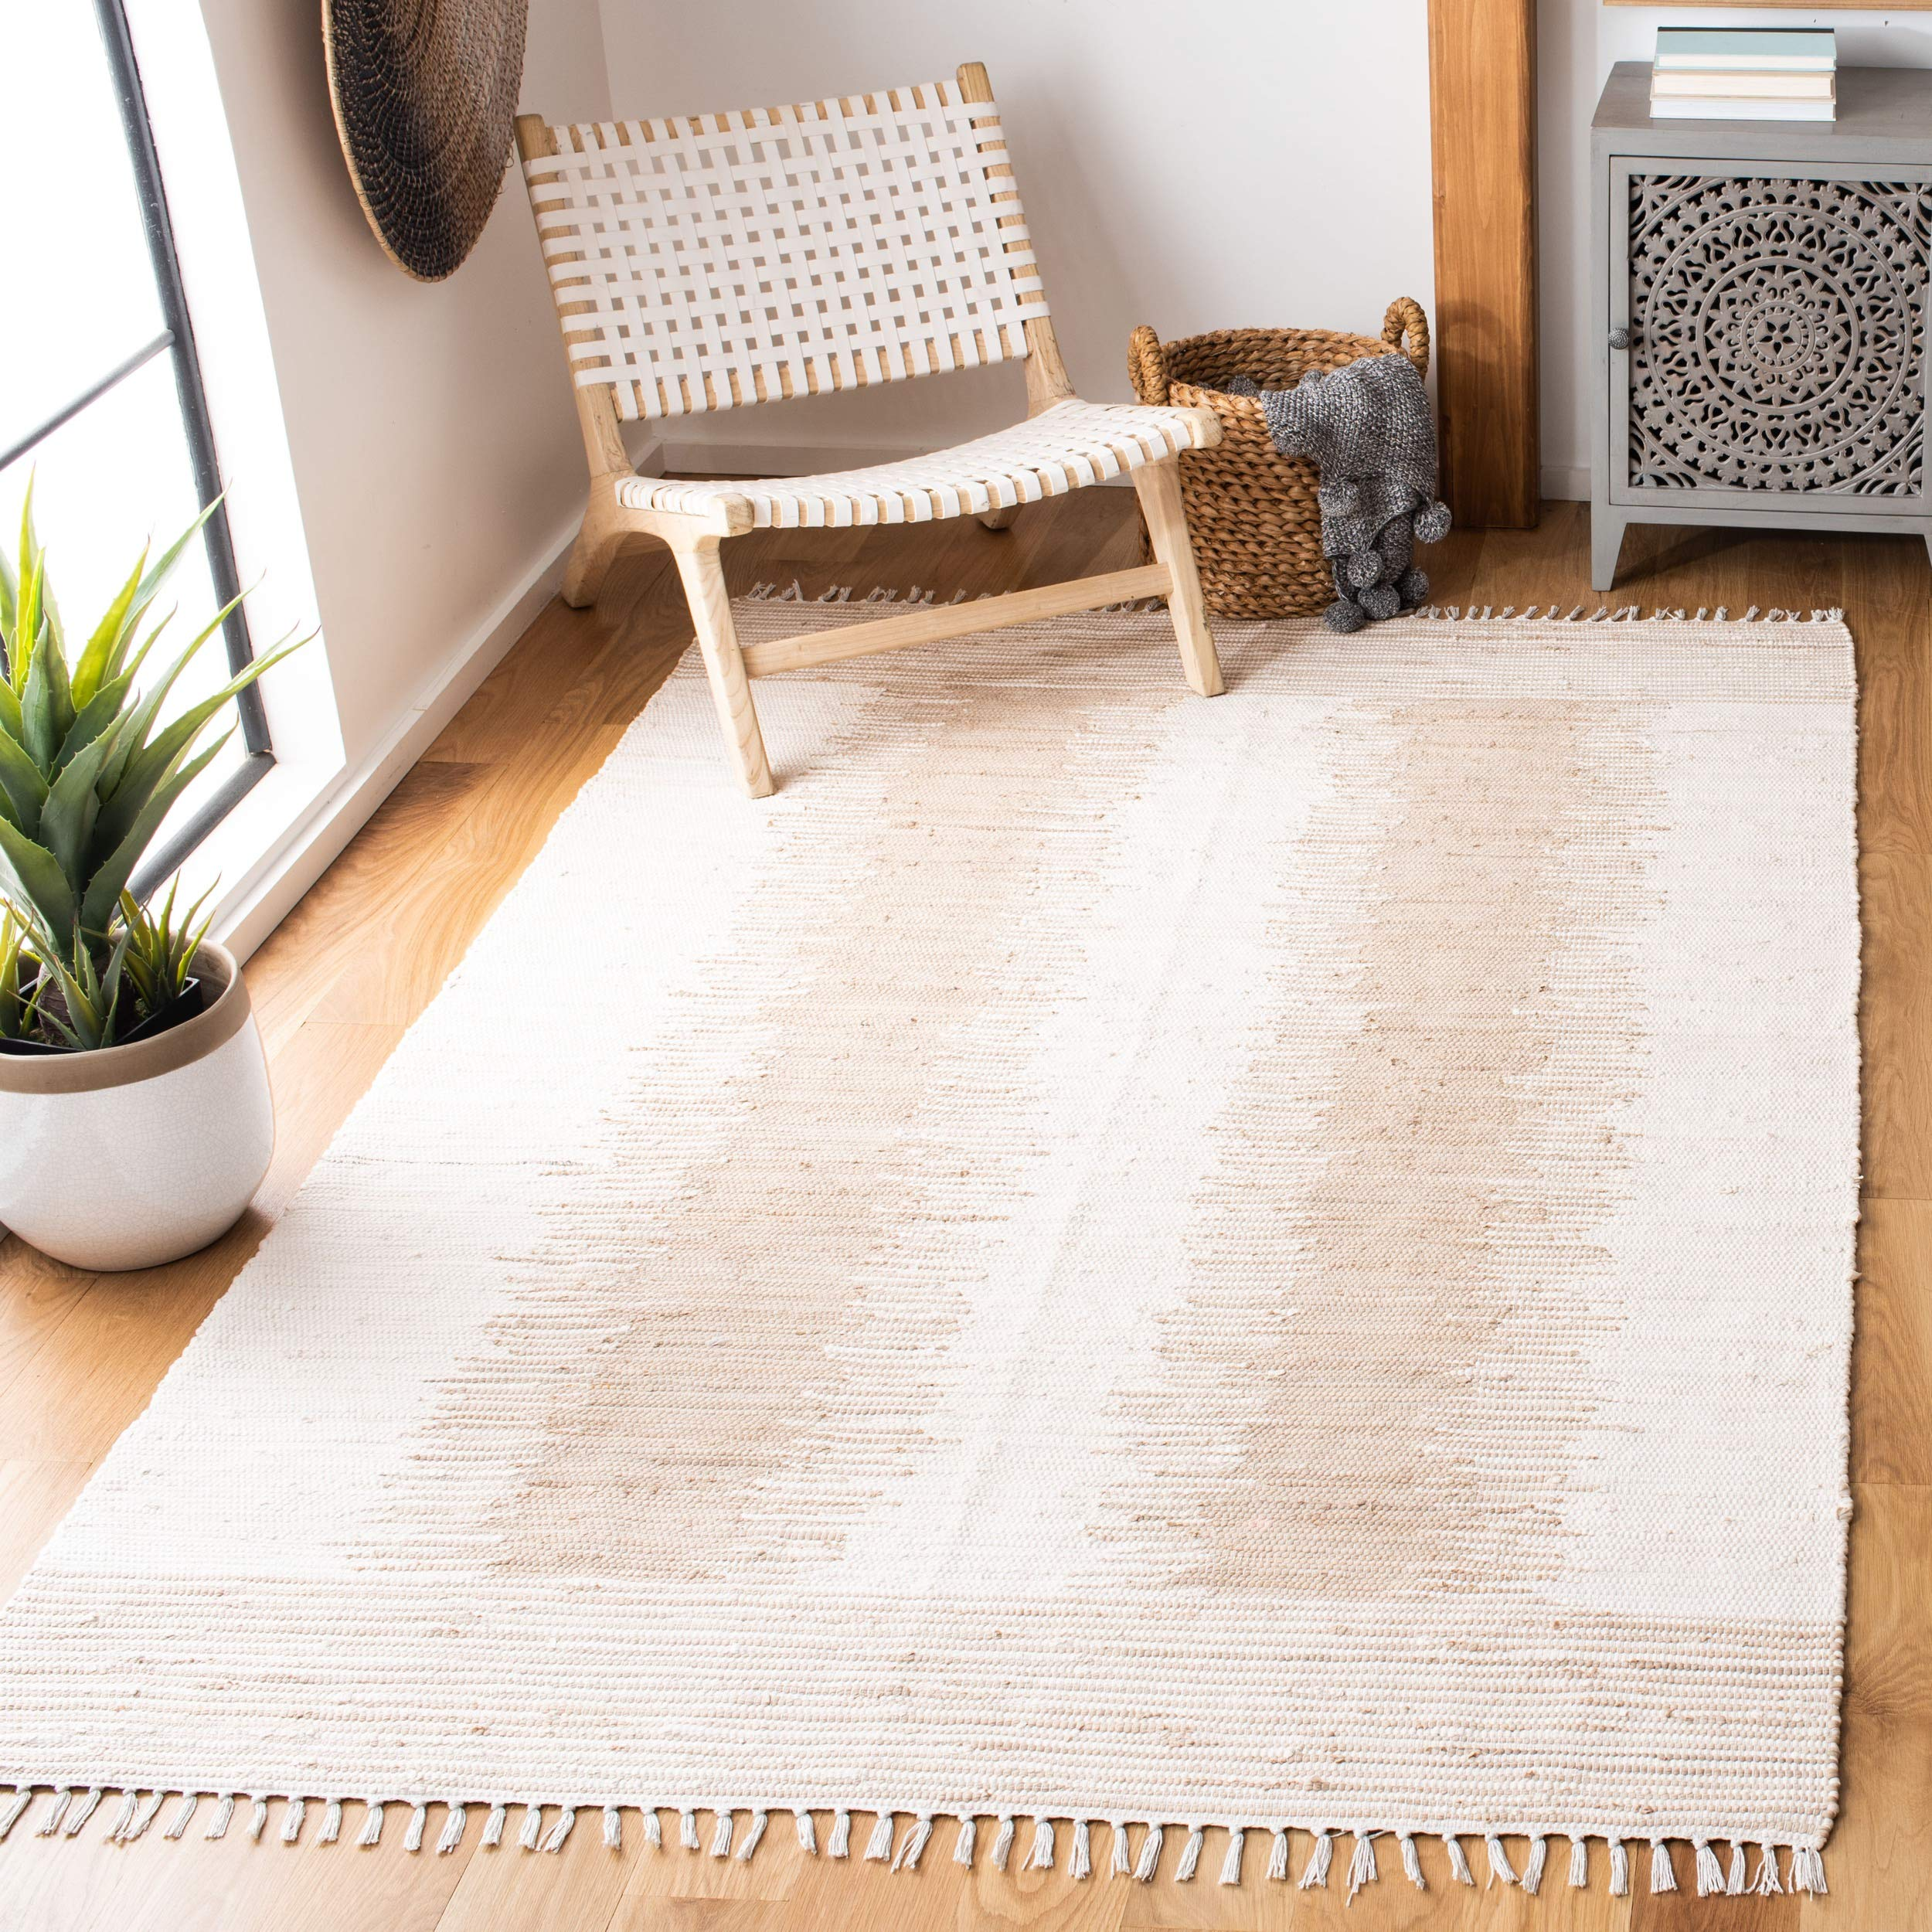 Safavieh Montauk Collection MTK752A Handmade Fringe Cotton Area Rug, 8' x 10', Beige